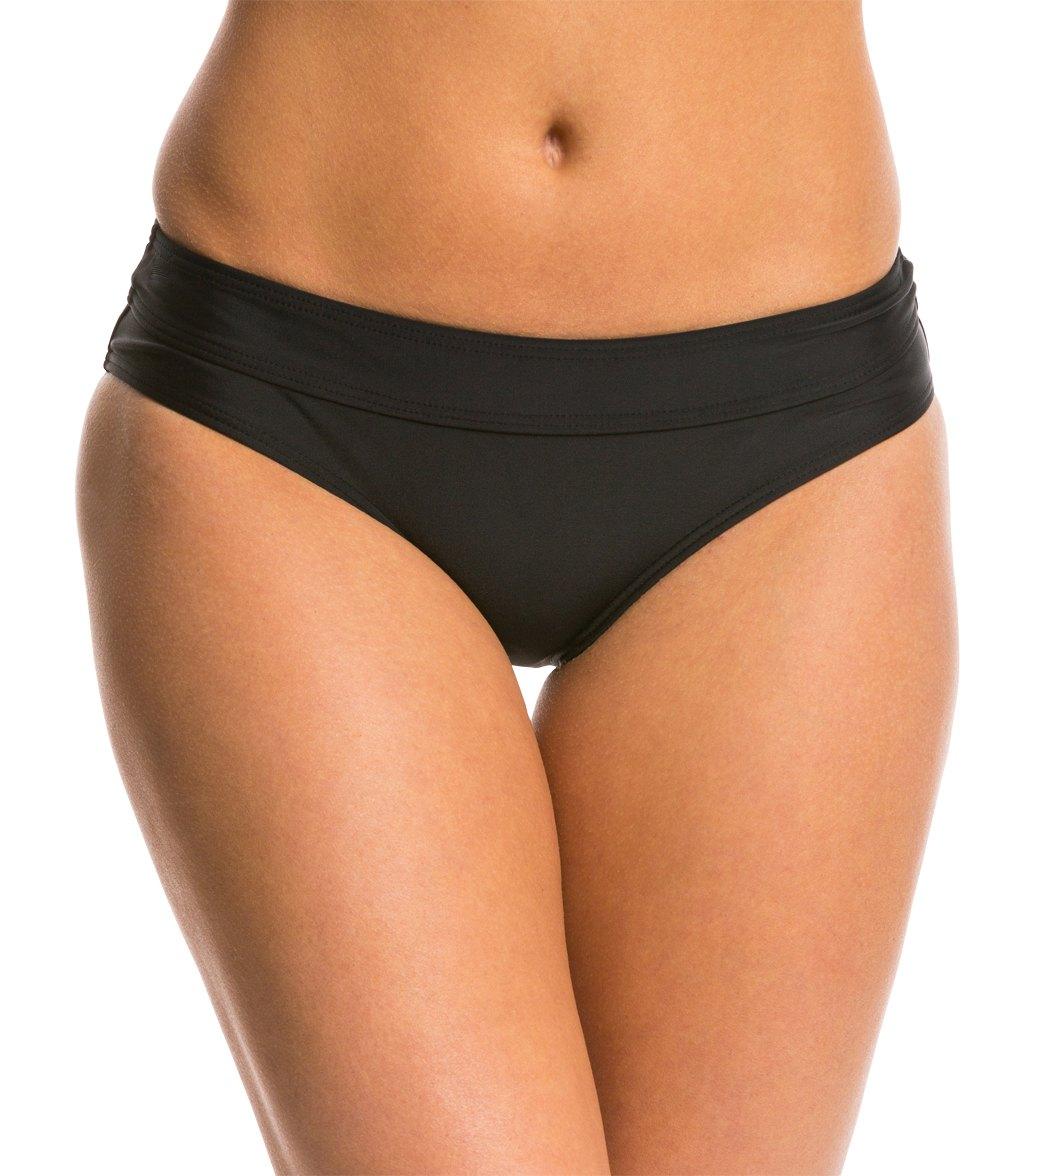 892854edcbe0 prAna Solid Ramba Bikini Bottom at SwimOutlet.com - Free Shipping